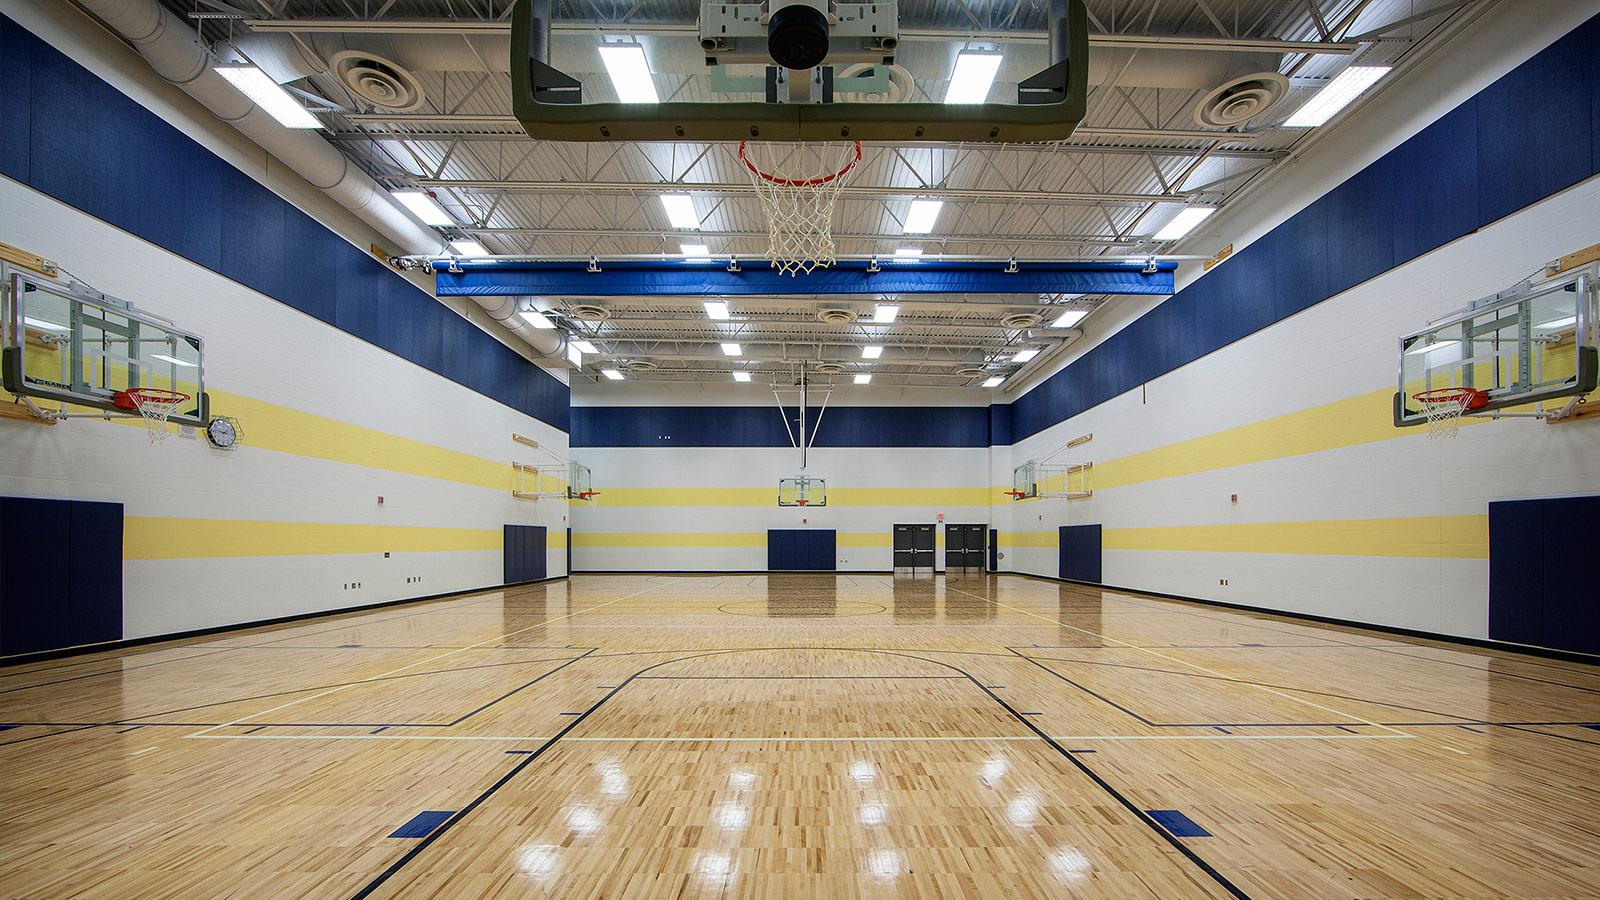 Rice Lake Area Schools Additions & Renovations